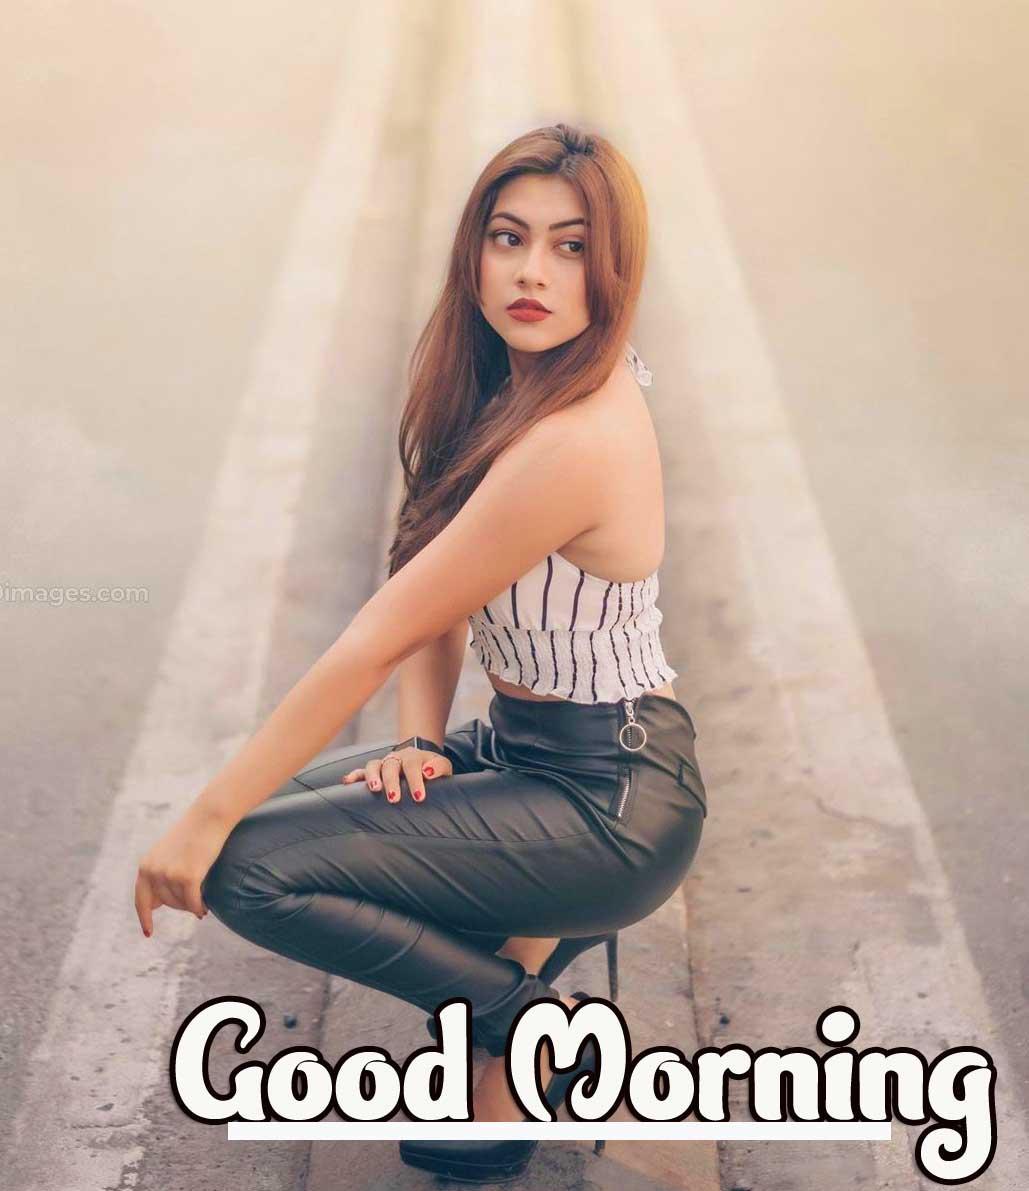 Good Morning Beautiful Ladies / Stylish Girls Images Wallpaper Free Download